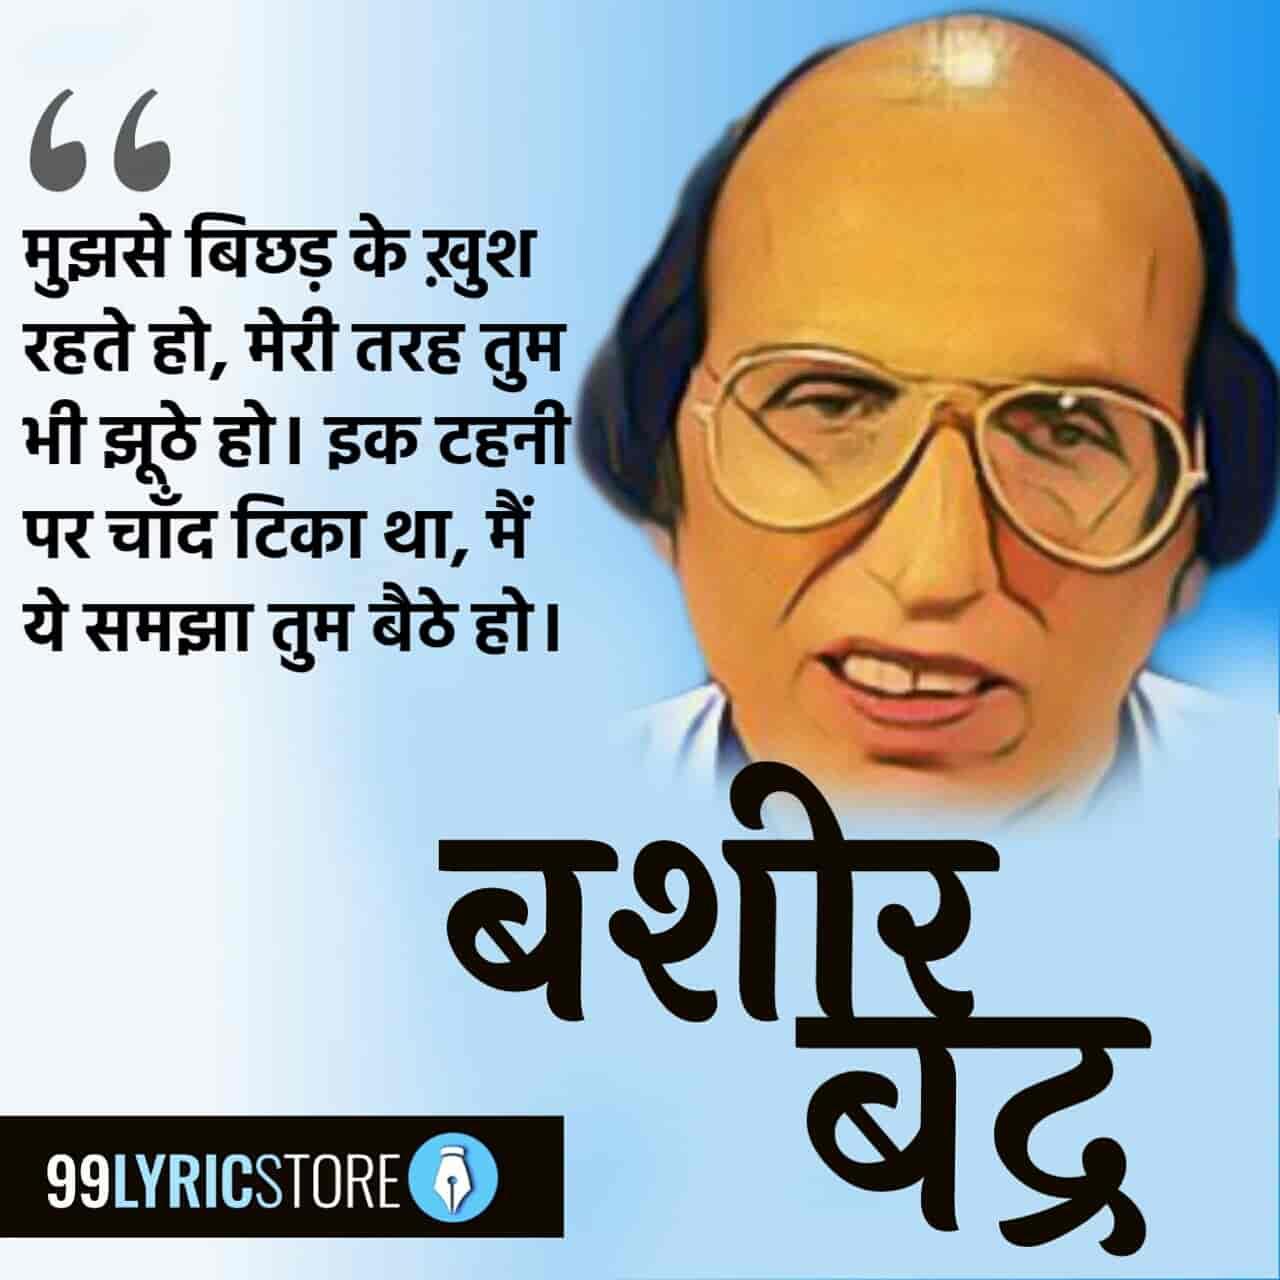 This beautiful ghazal 'Mujhse Bichhad Ke Khush Rahte Ho' has written by Bashir Badr.